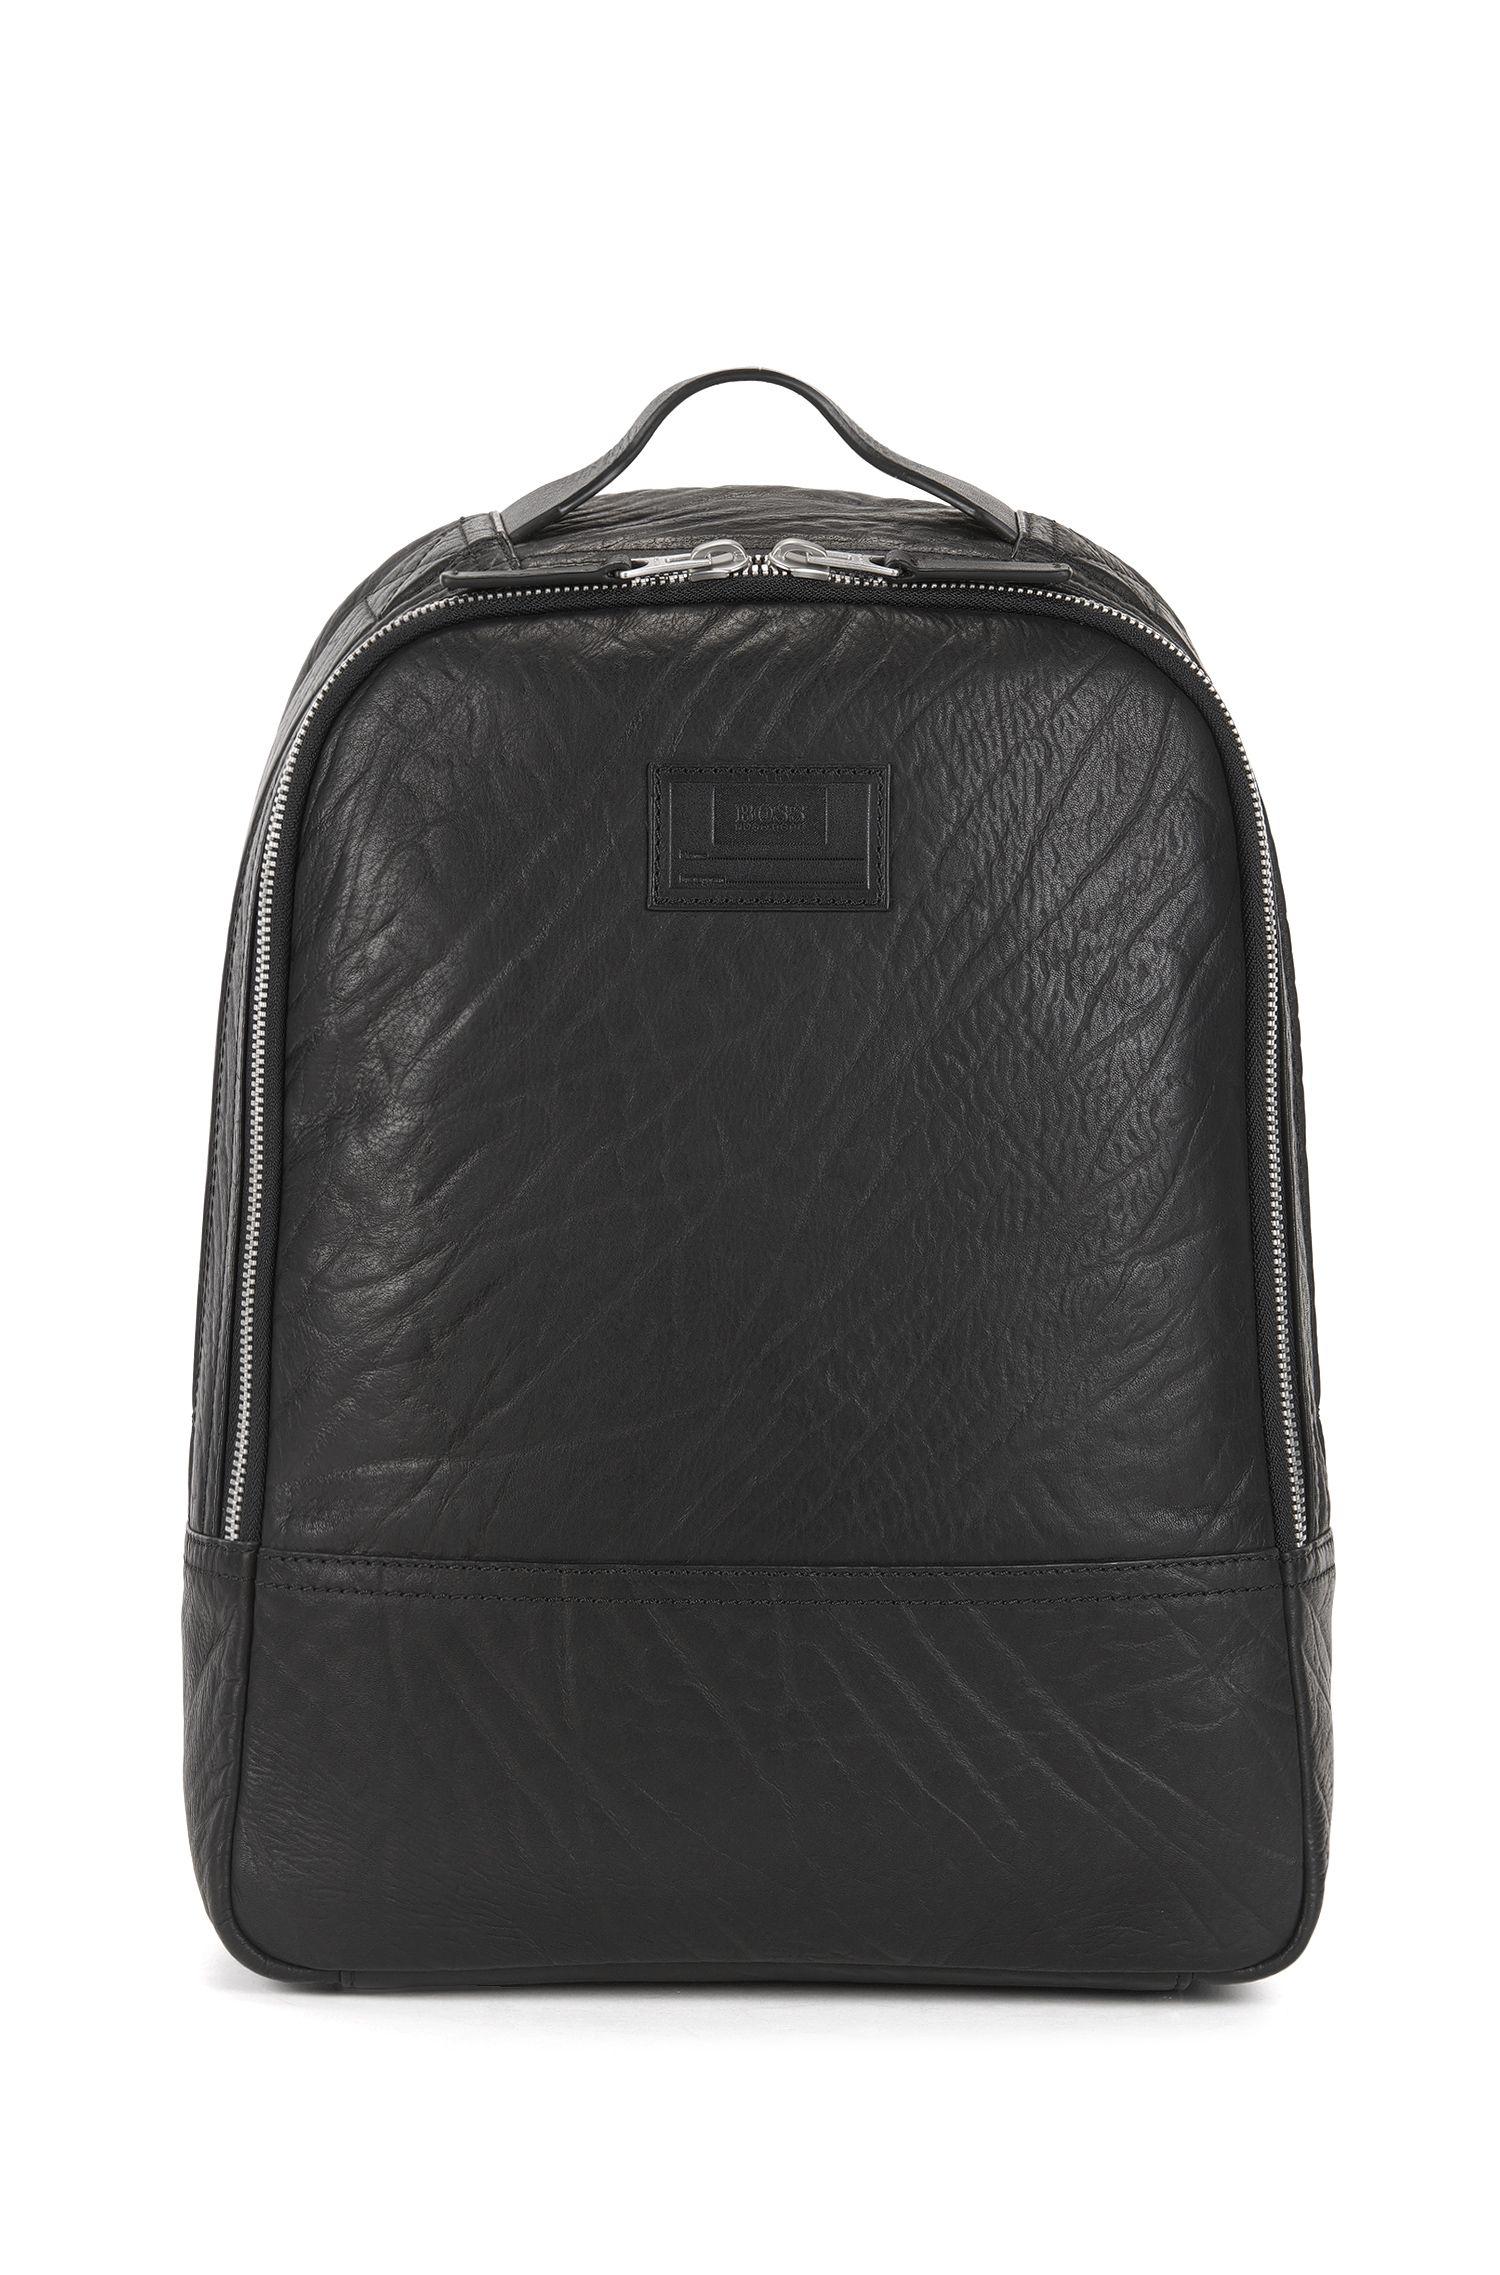 Geräumiger Rucksack aus genarbtem Leder